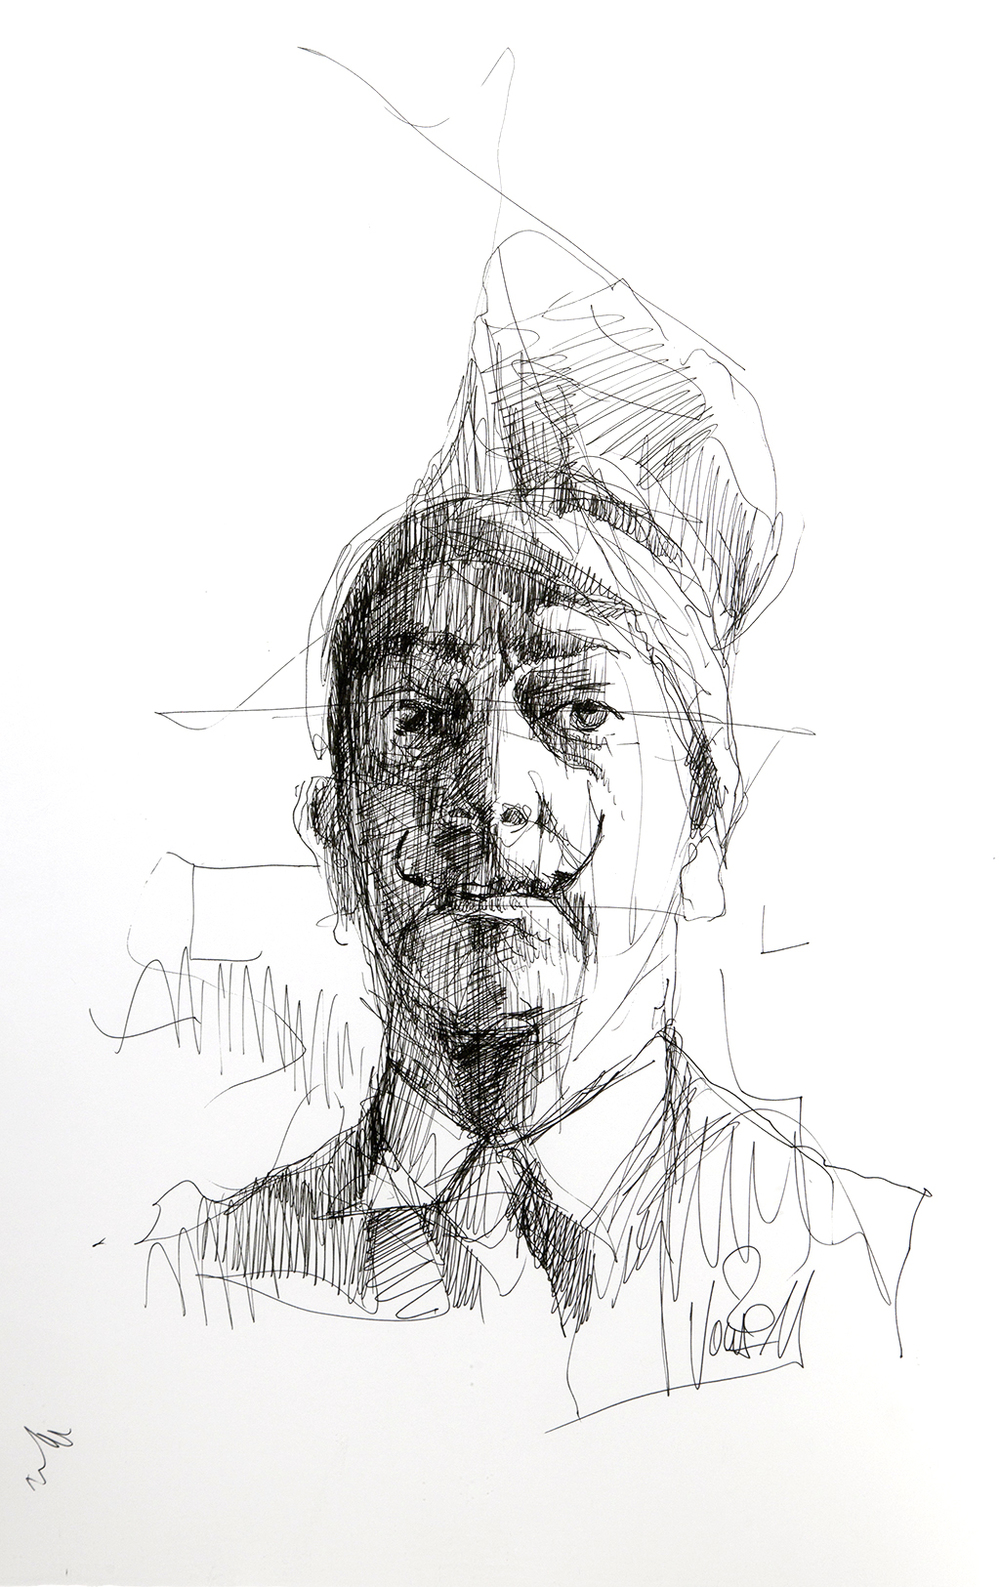 2011 05 Dali , Skizze 32,5x42 cm.jpg